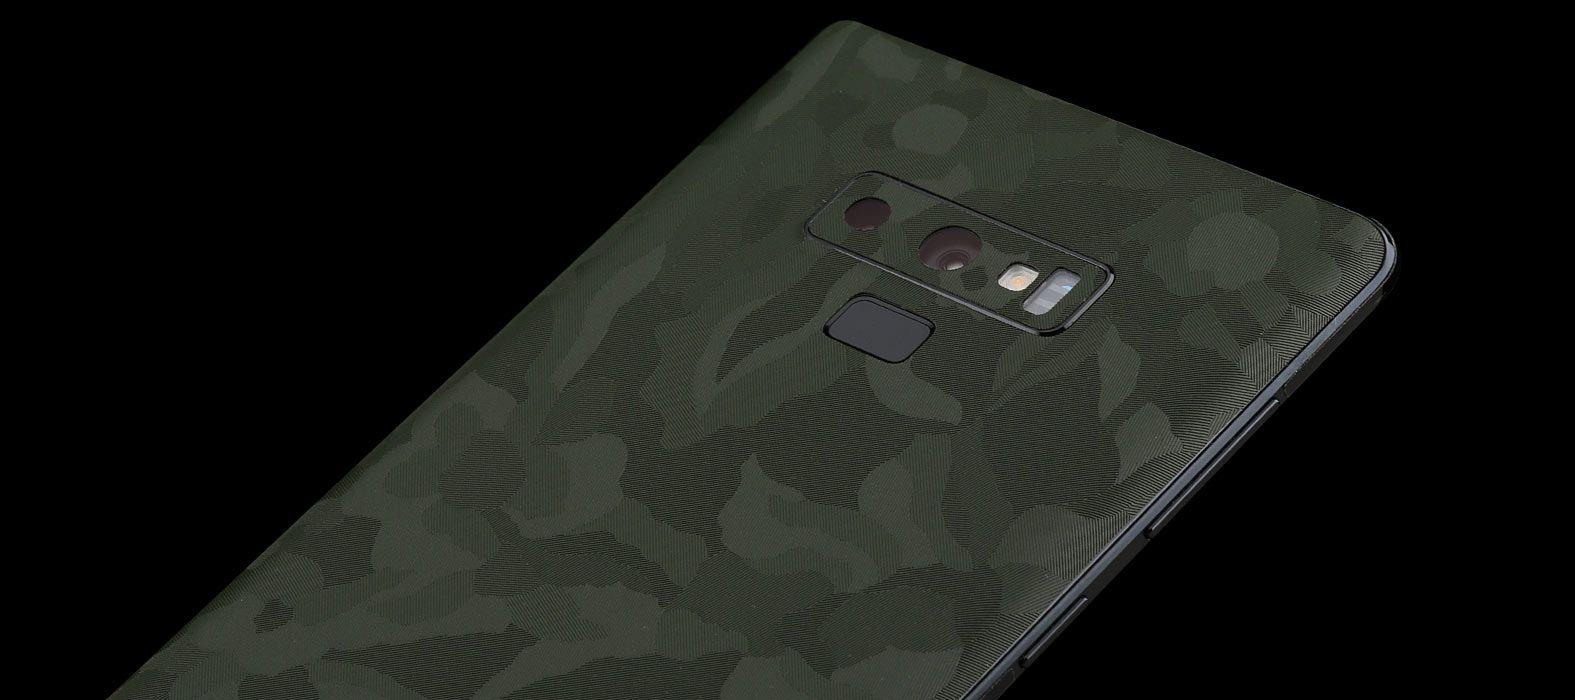 Galaxy Note 9 Green Camo Skins